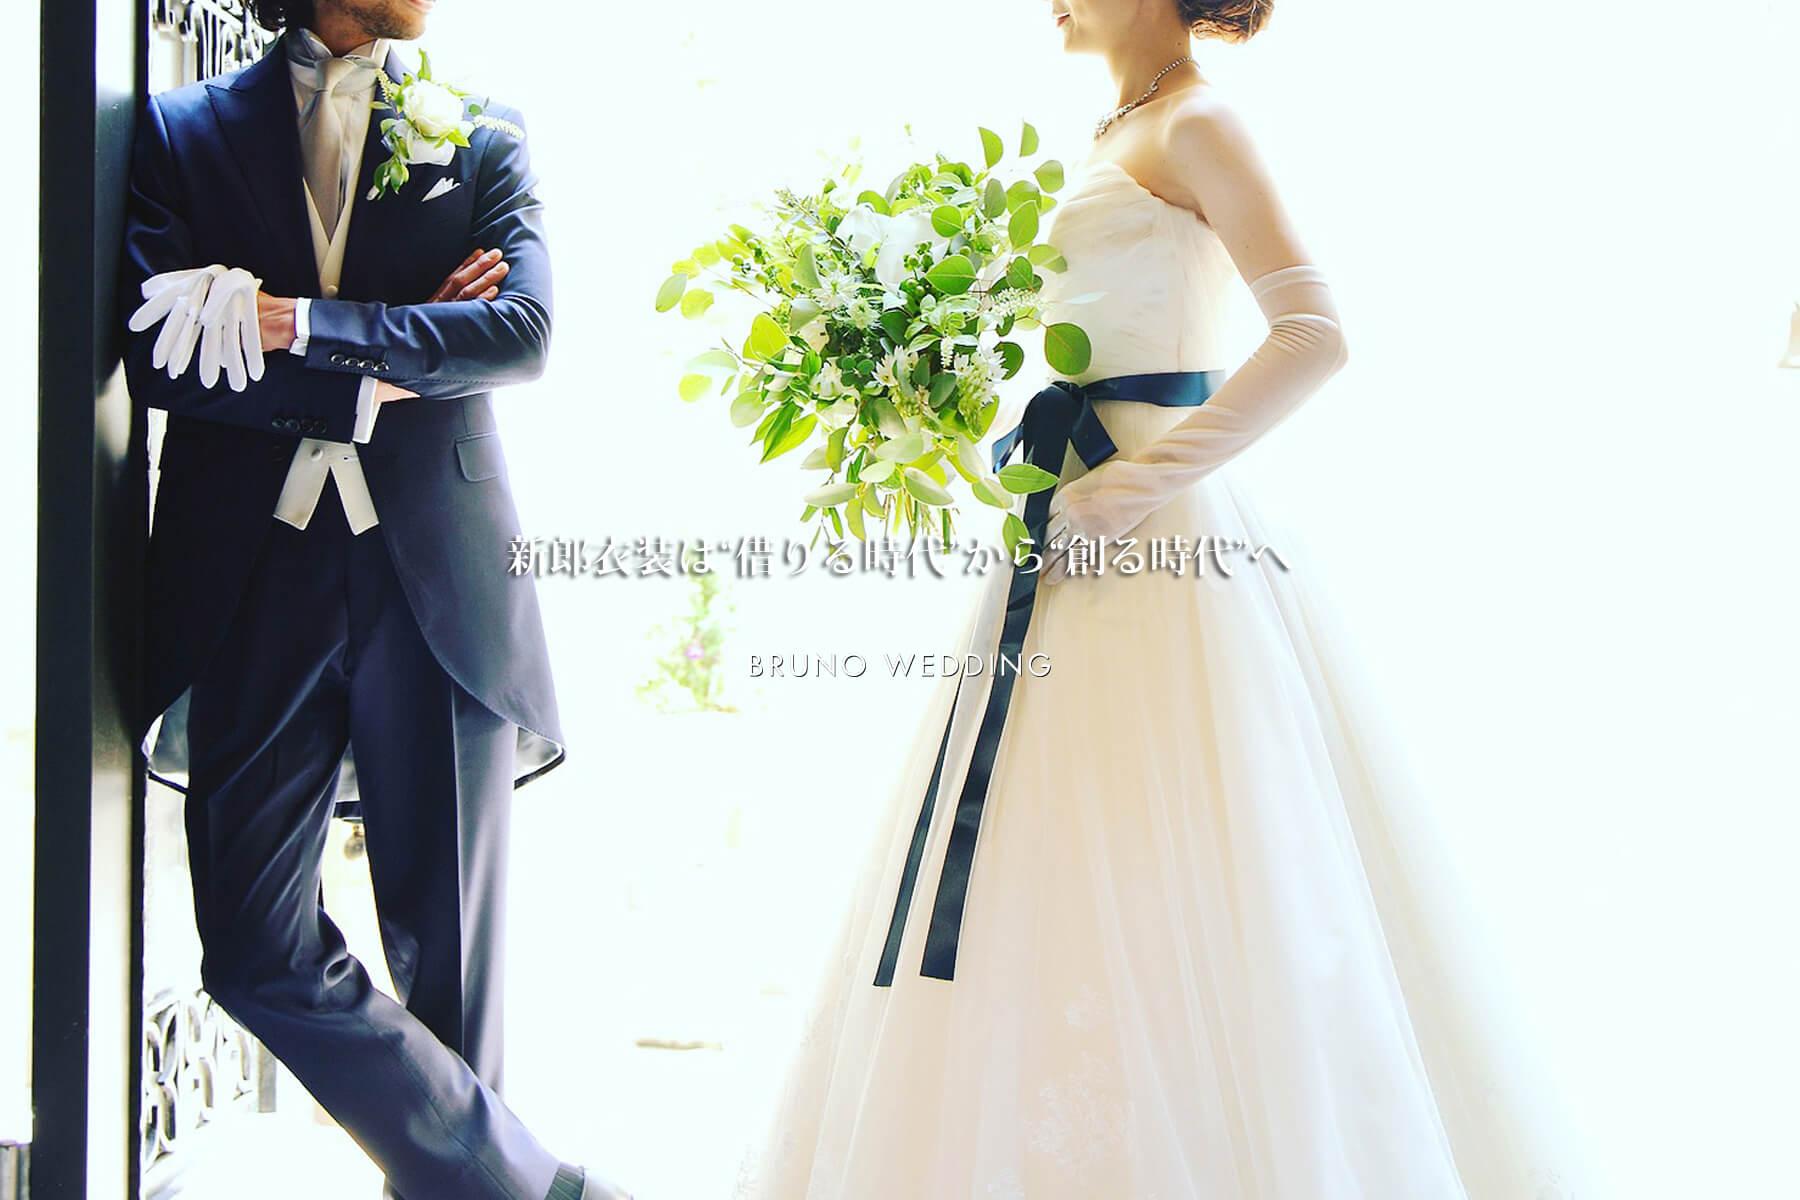 BRUNO WEDDING